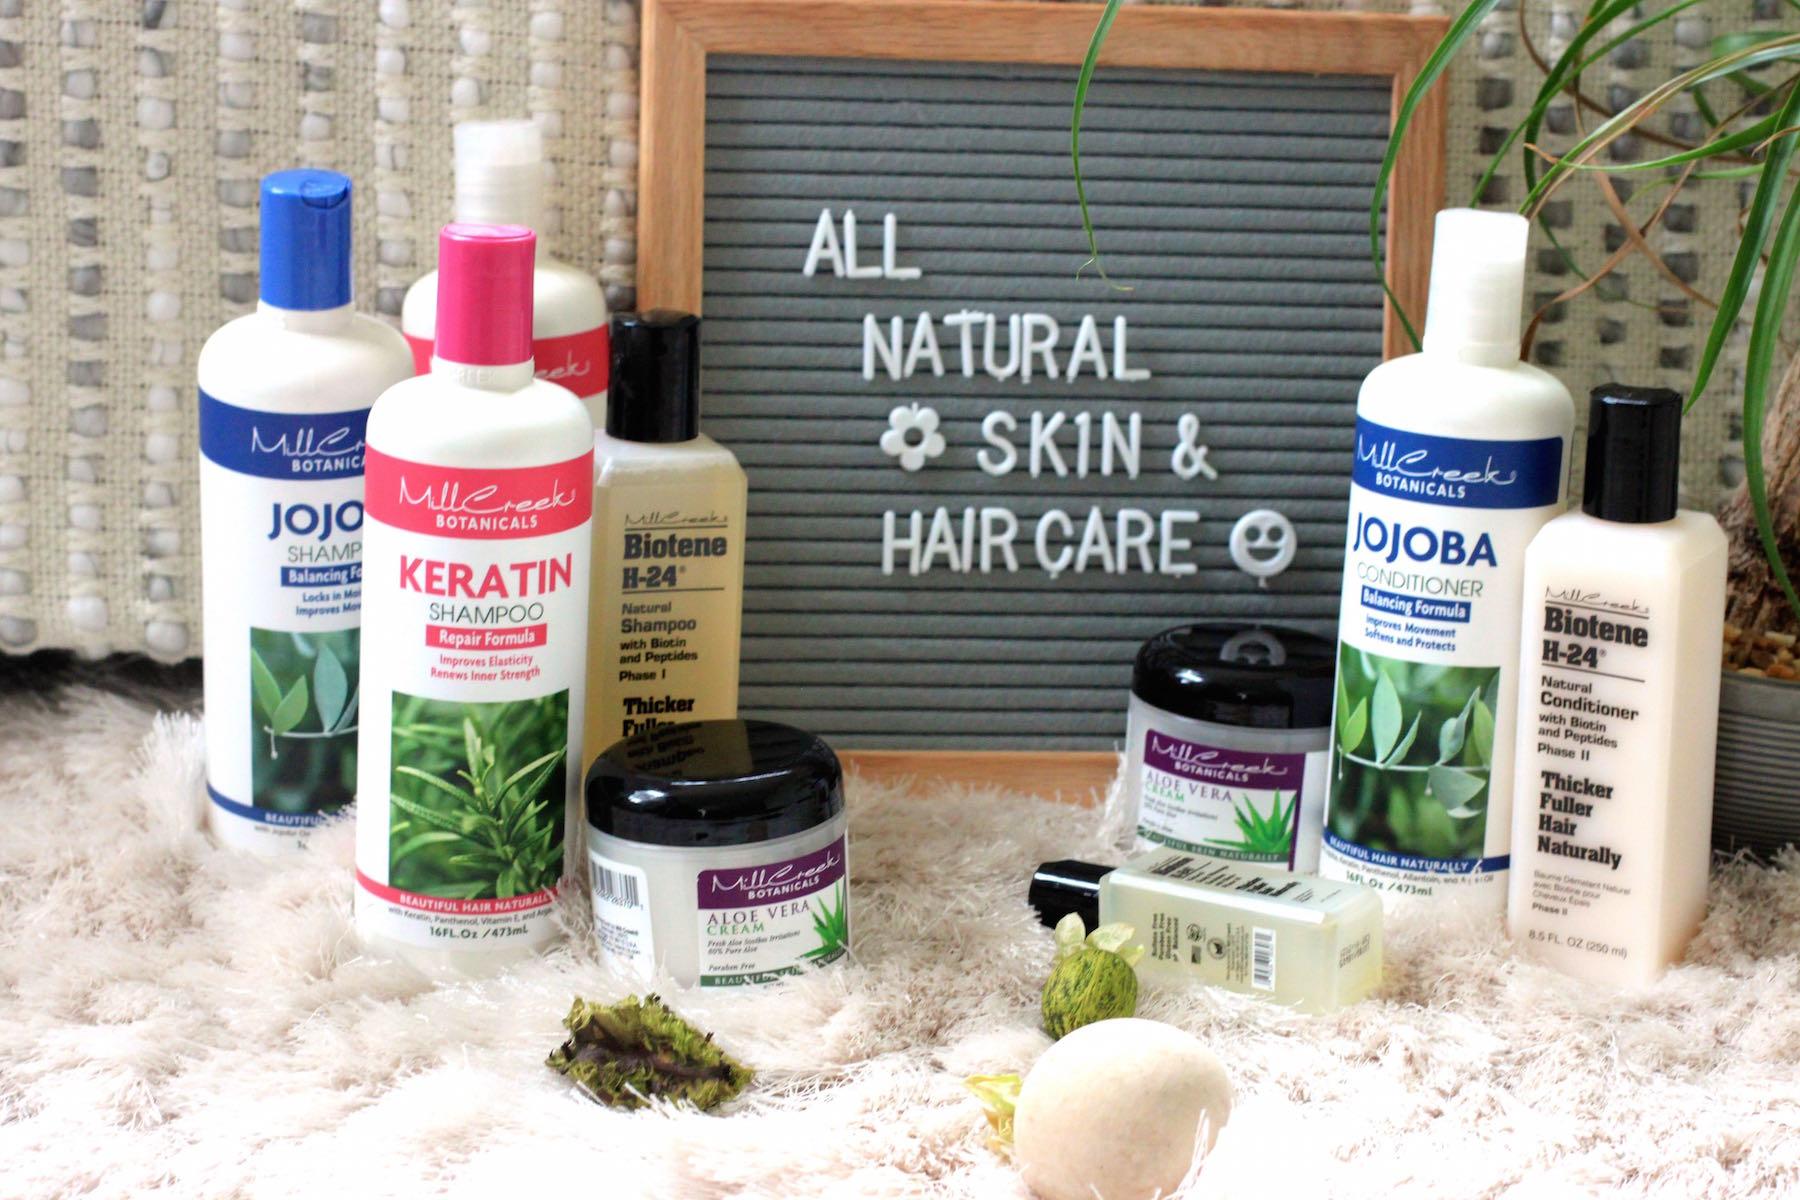 Mill creek botanicals organic skin care